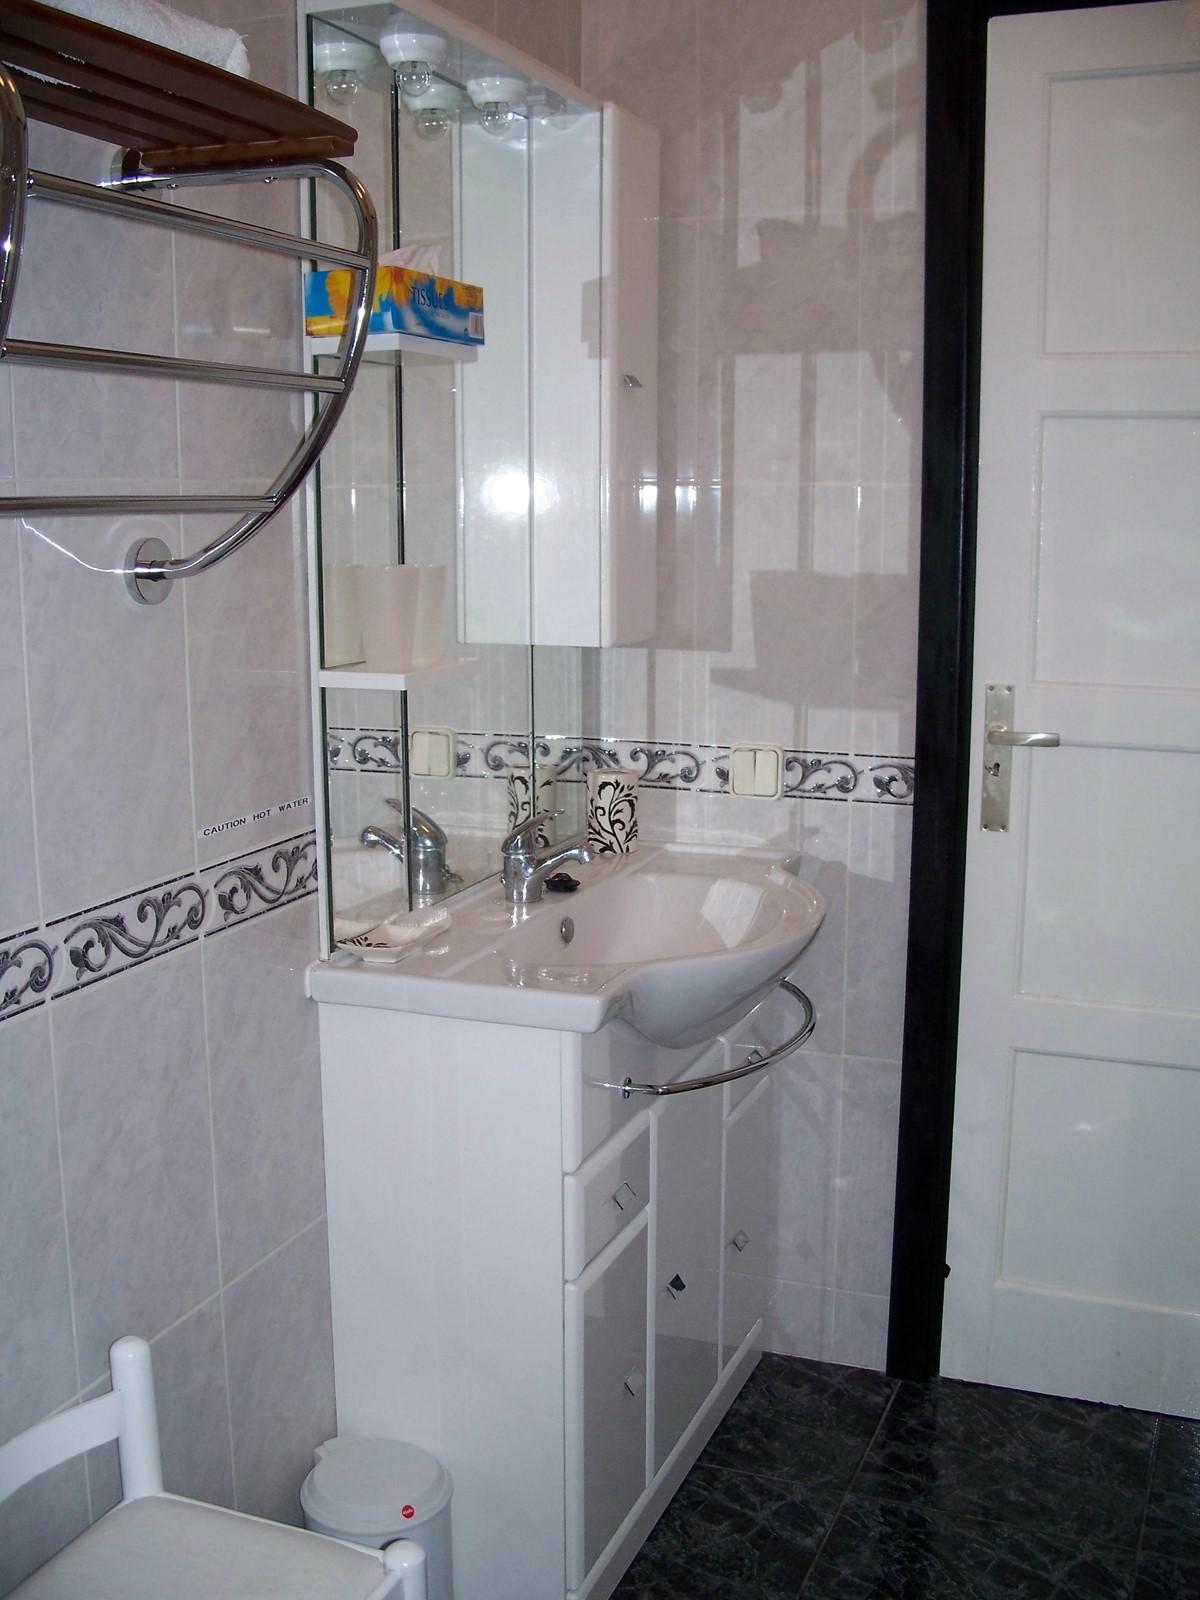 New Bathroom 2 Feb 07